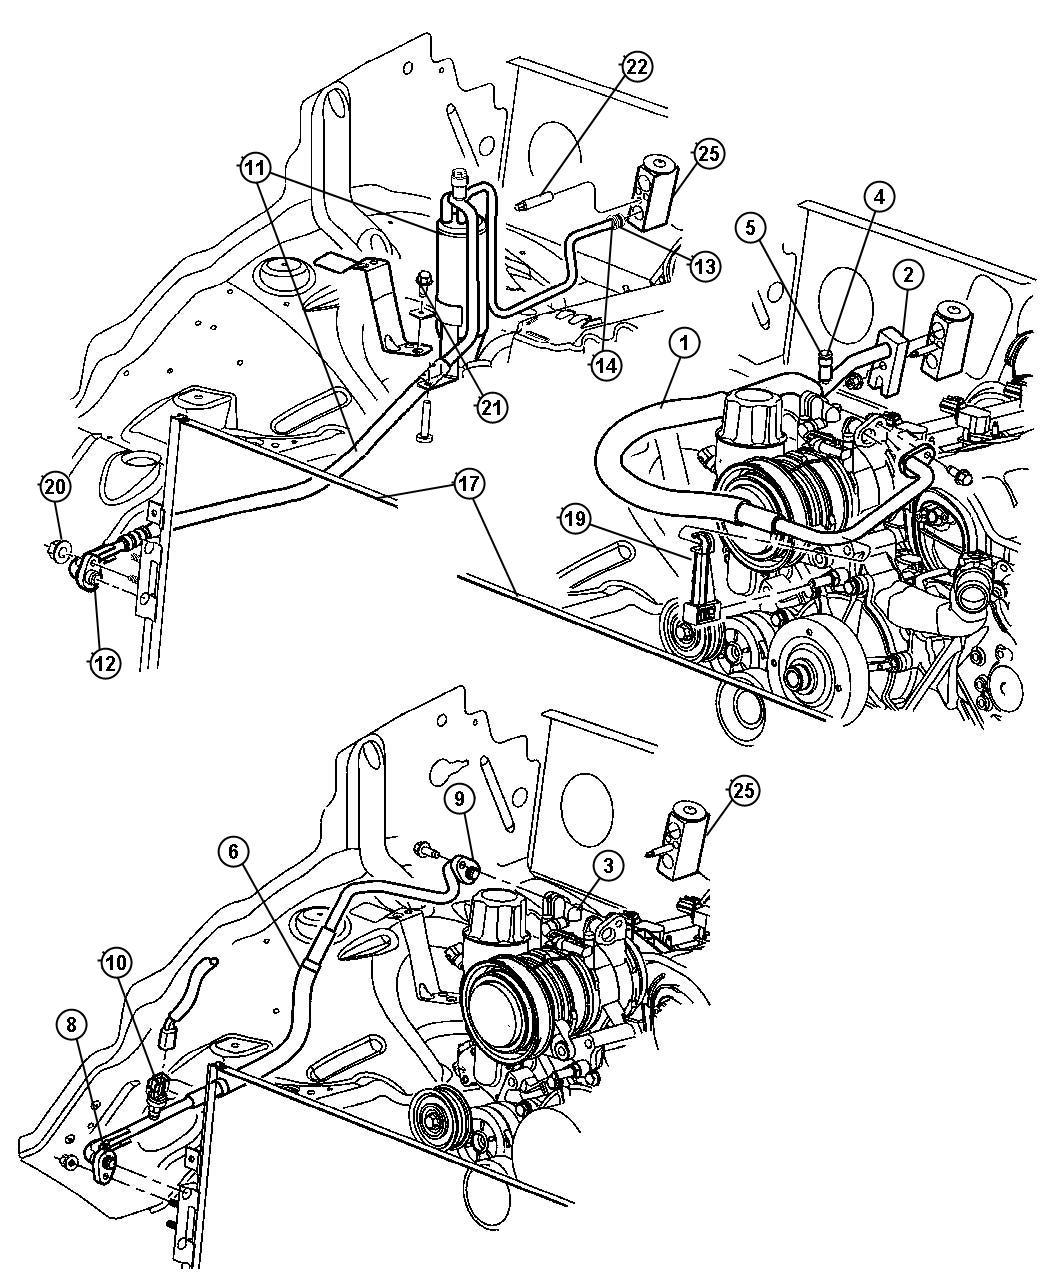 Dodge Avenger Transducer, valve. A/c pressure transducer